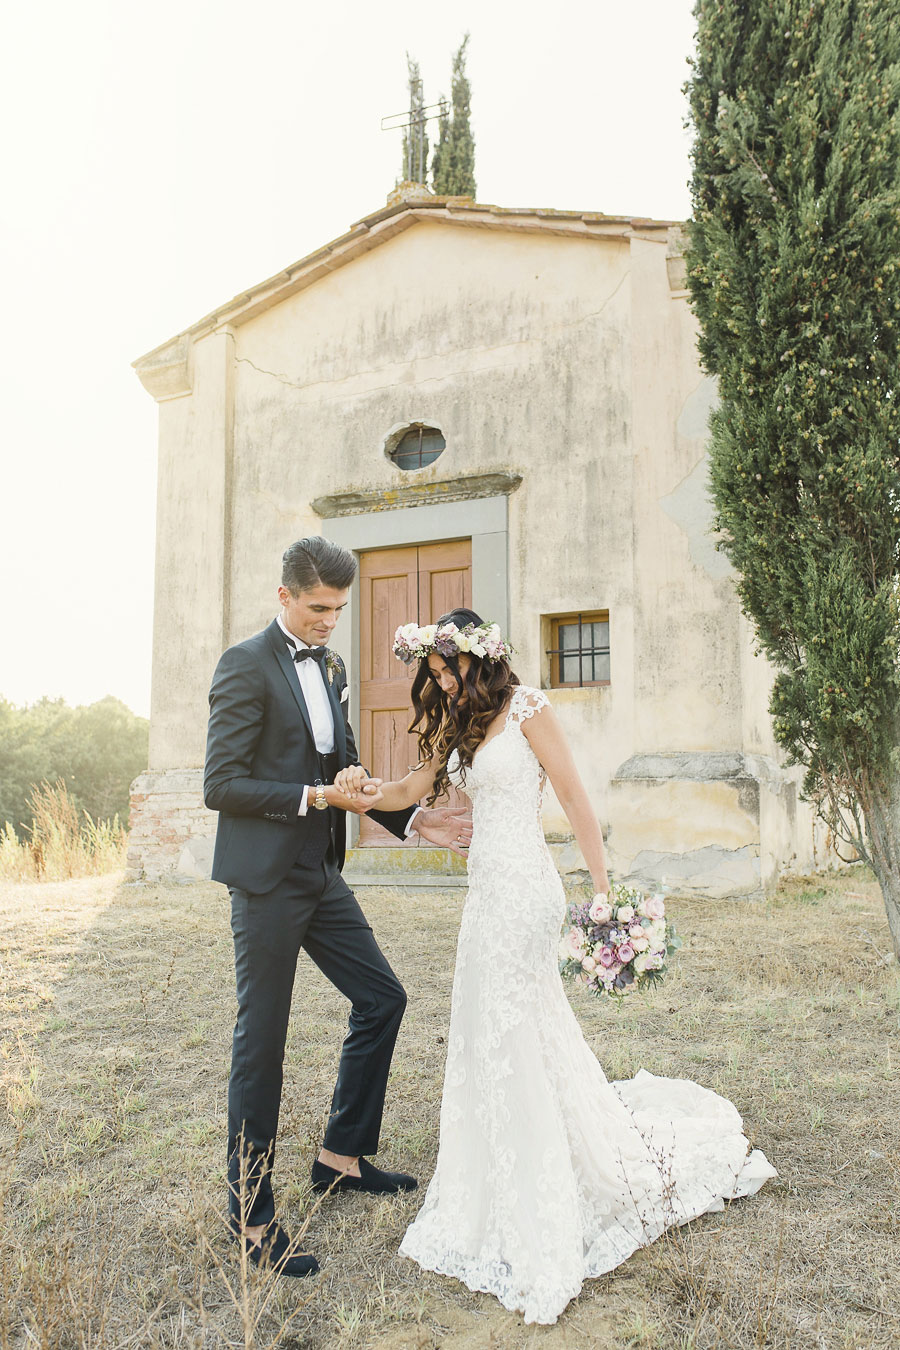 Wedding-Nicholad-and-Federica-Giuseppe-Giovannelli-236